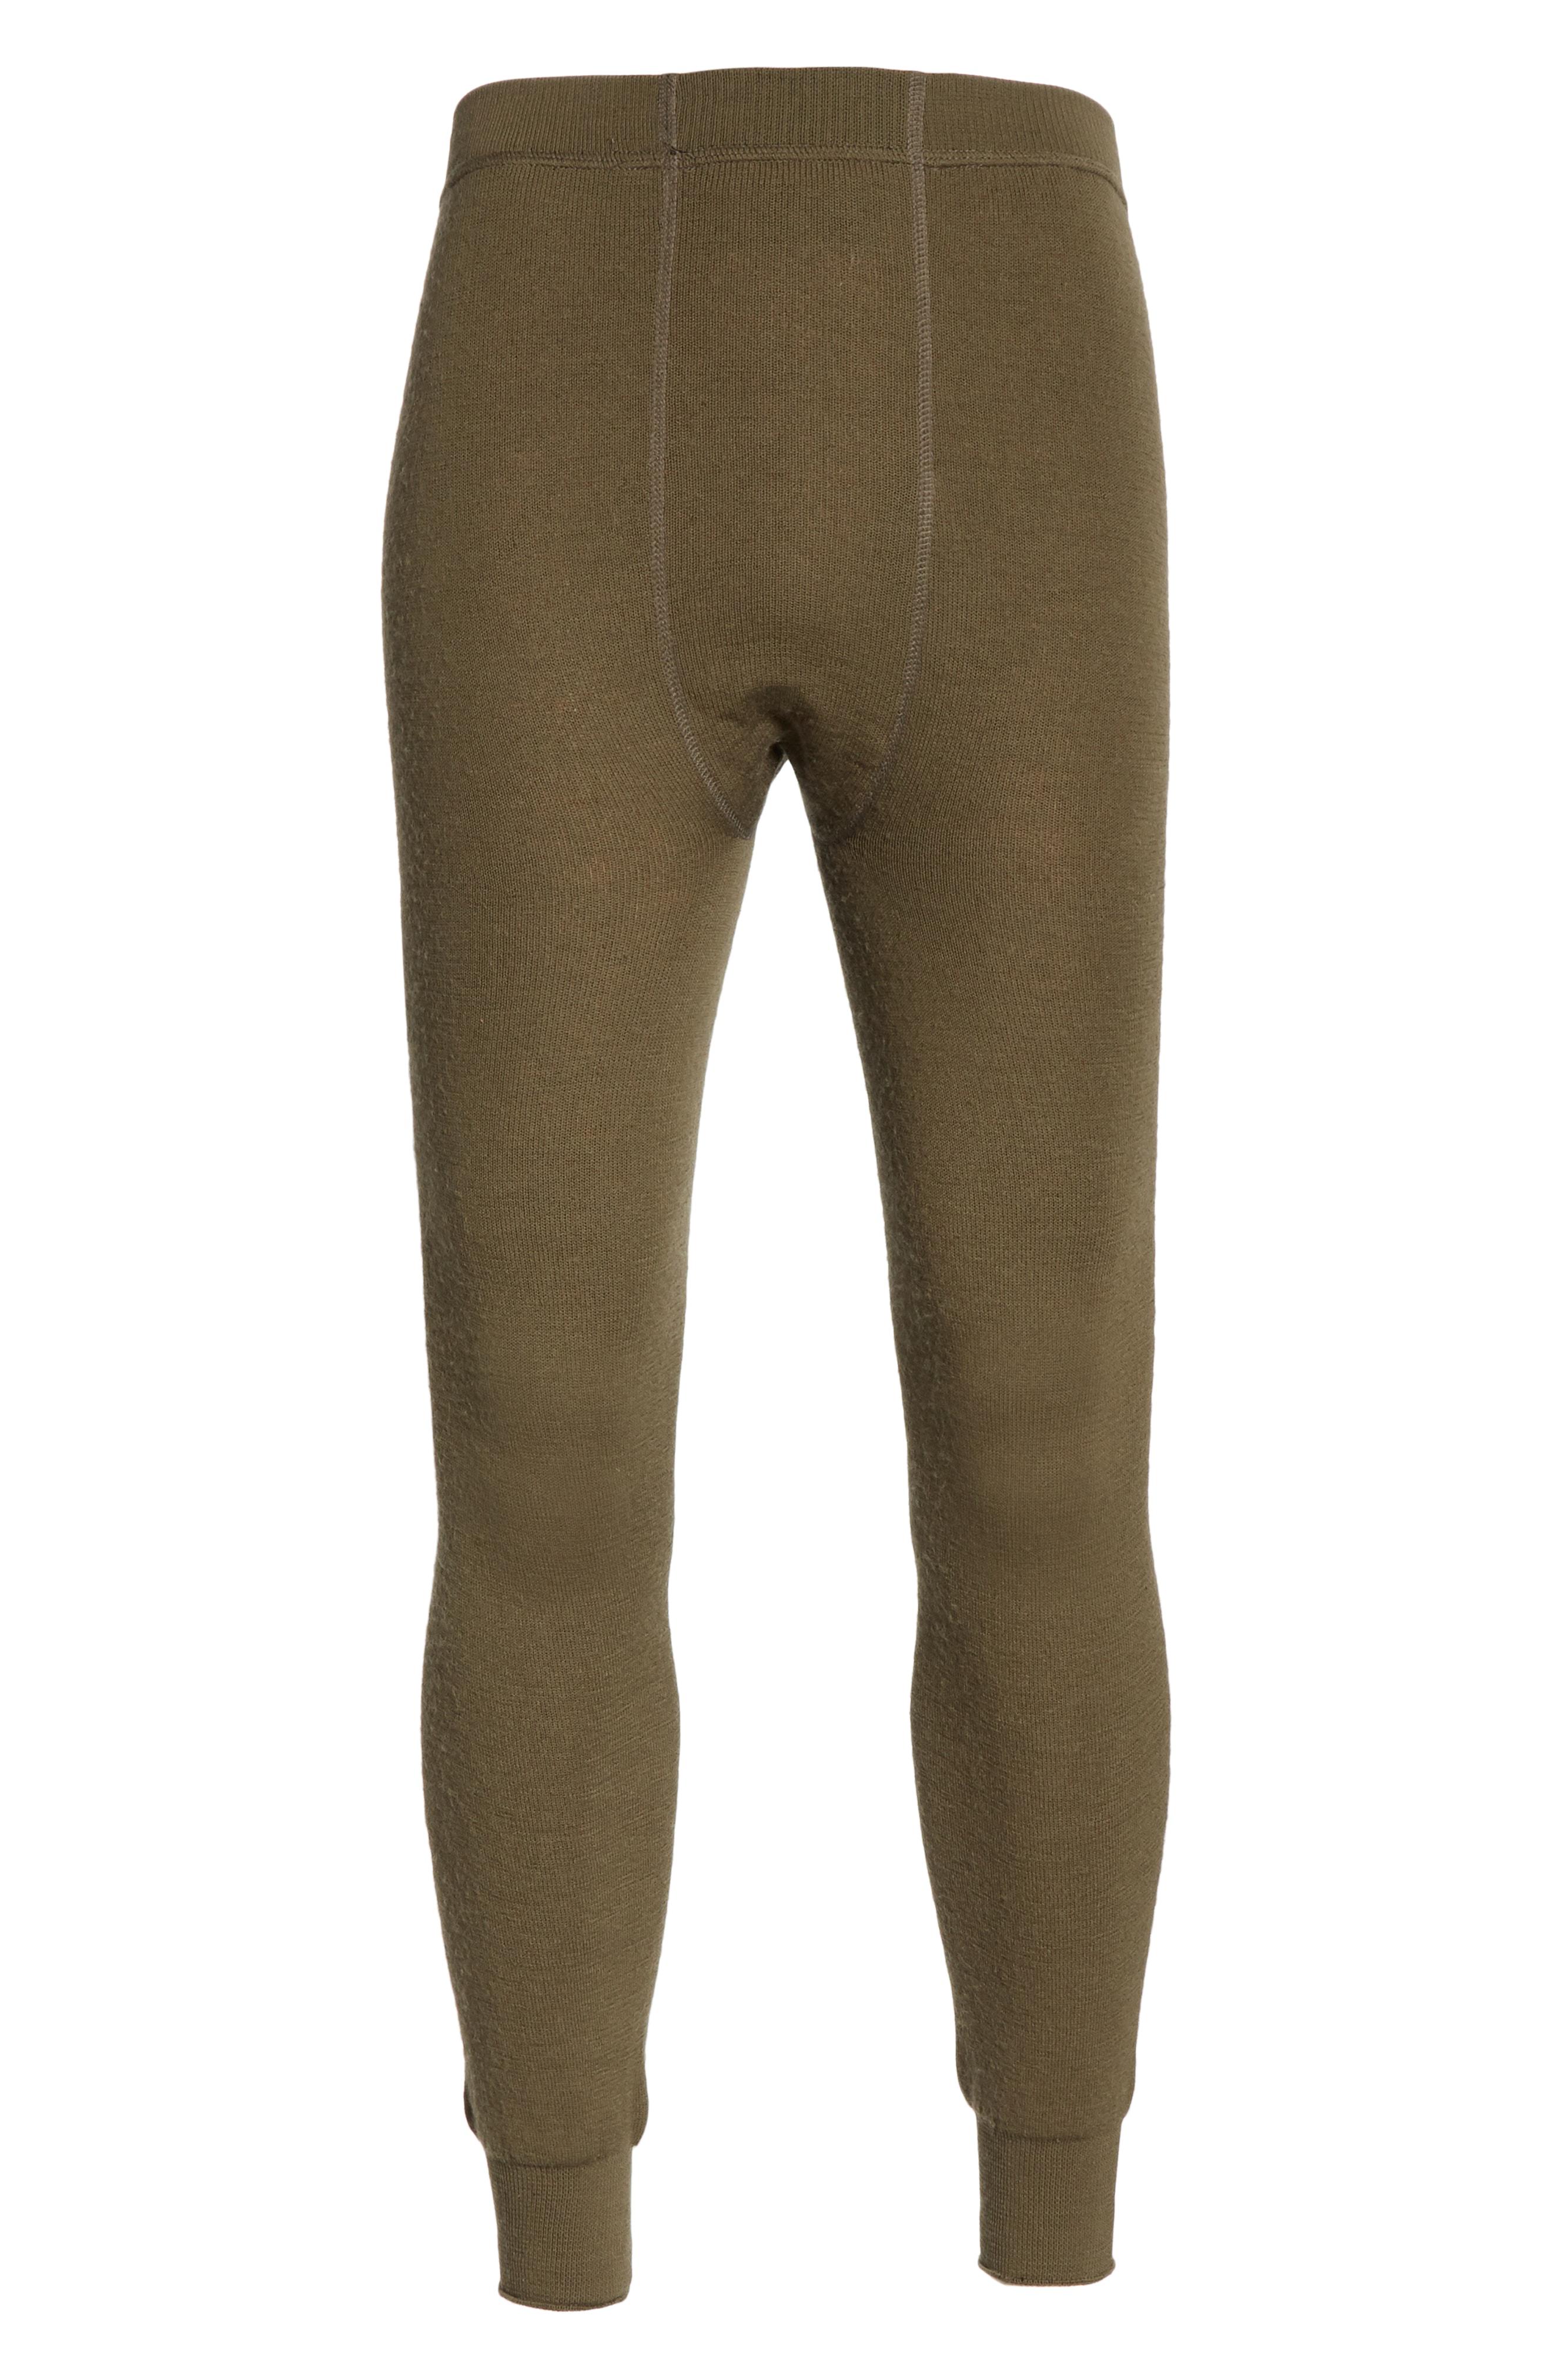 e2f2e230a678e Woolpower Long Johns 200 Thermal Leggings In Green | ModeSens